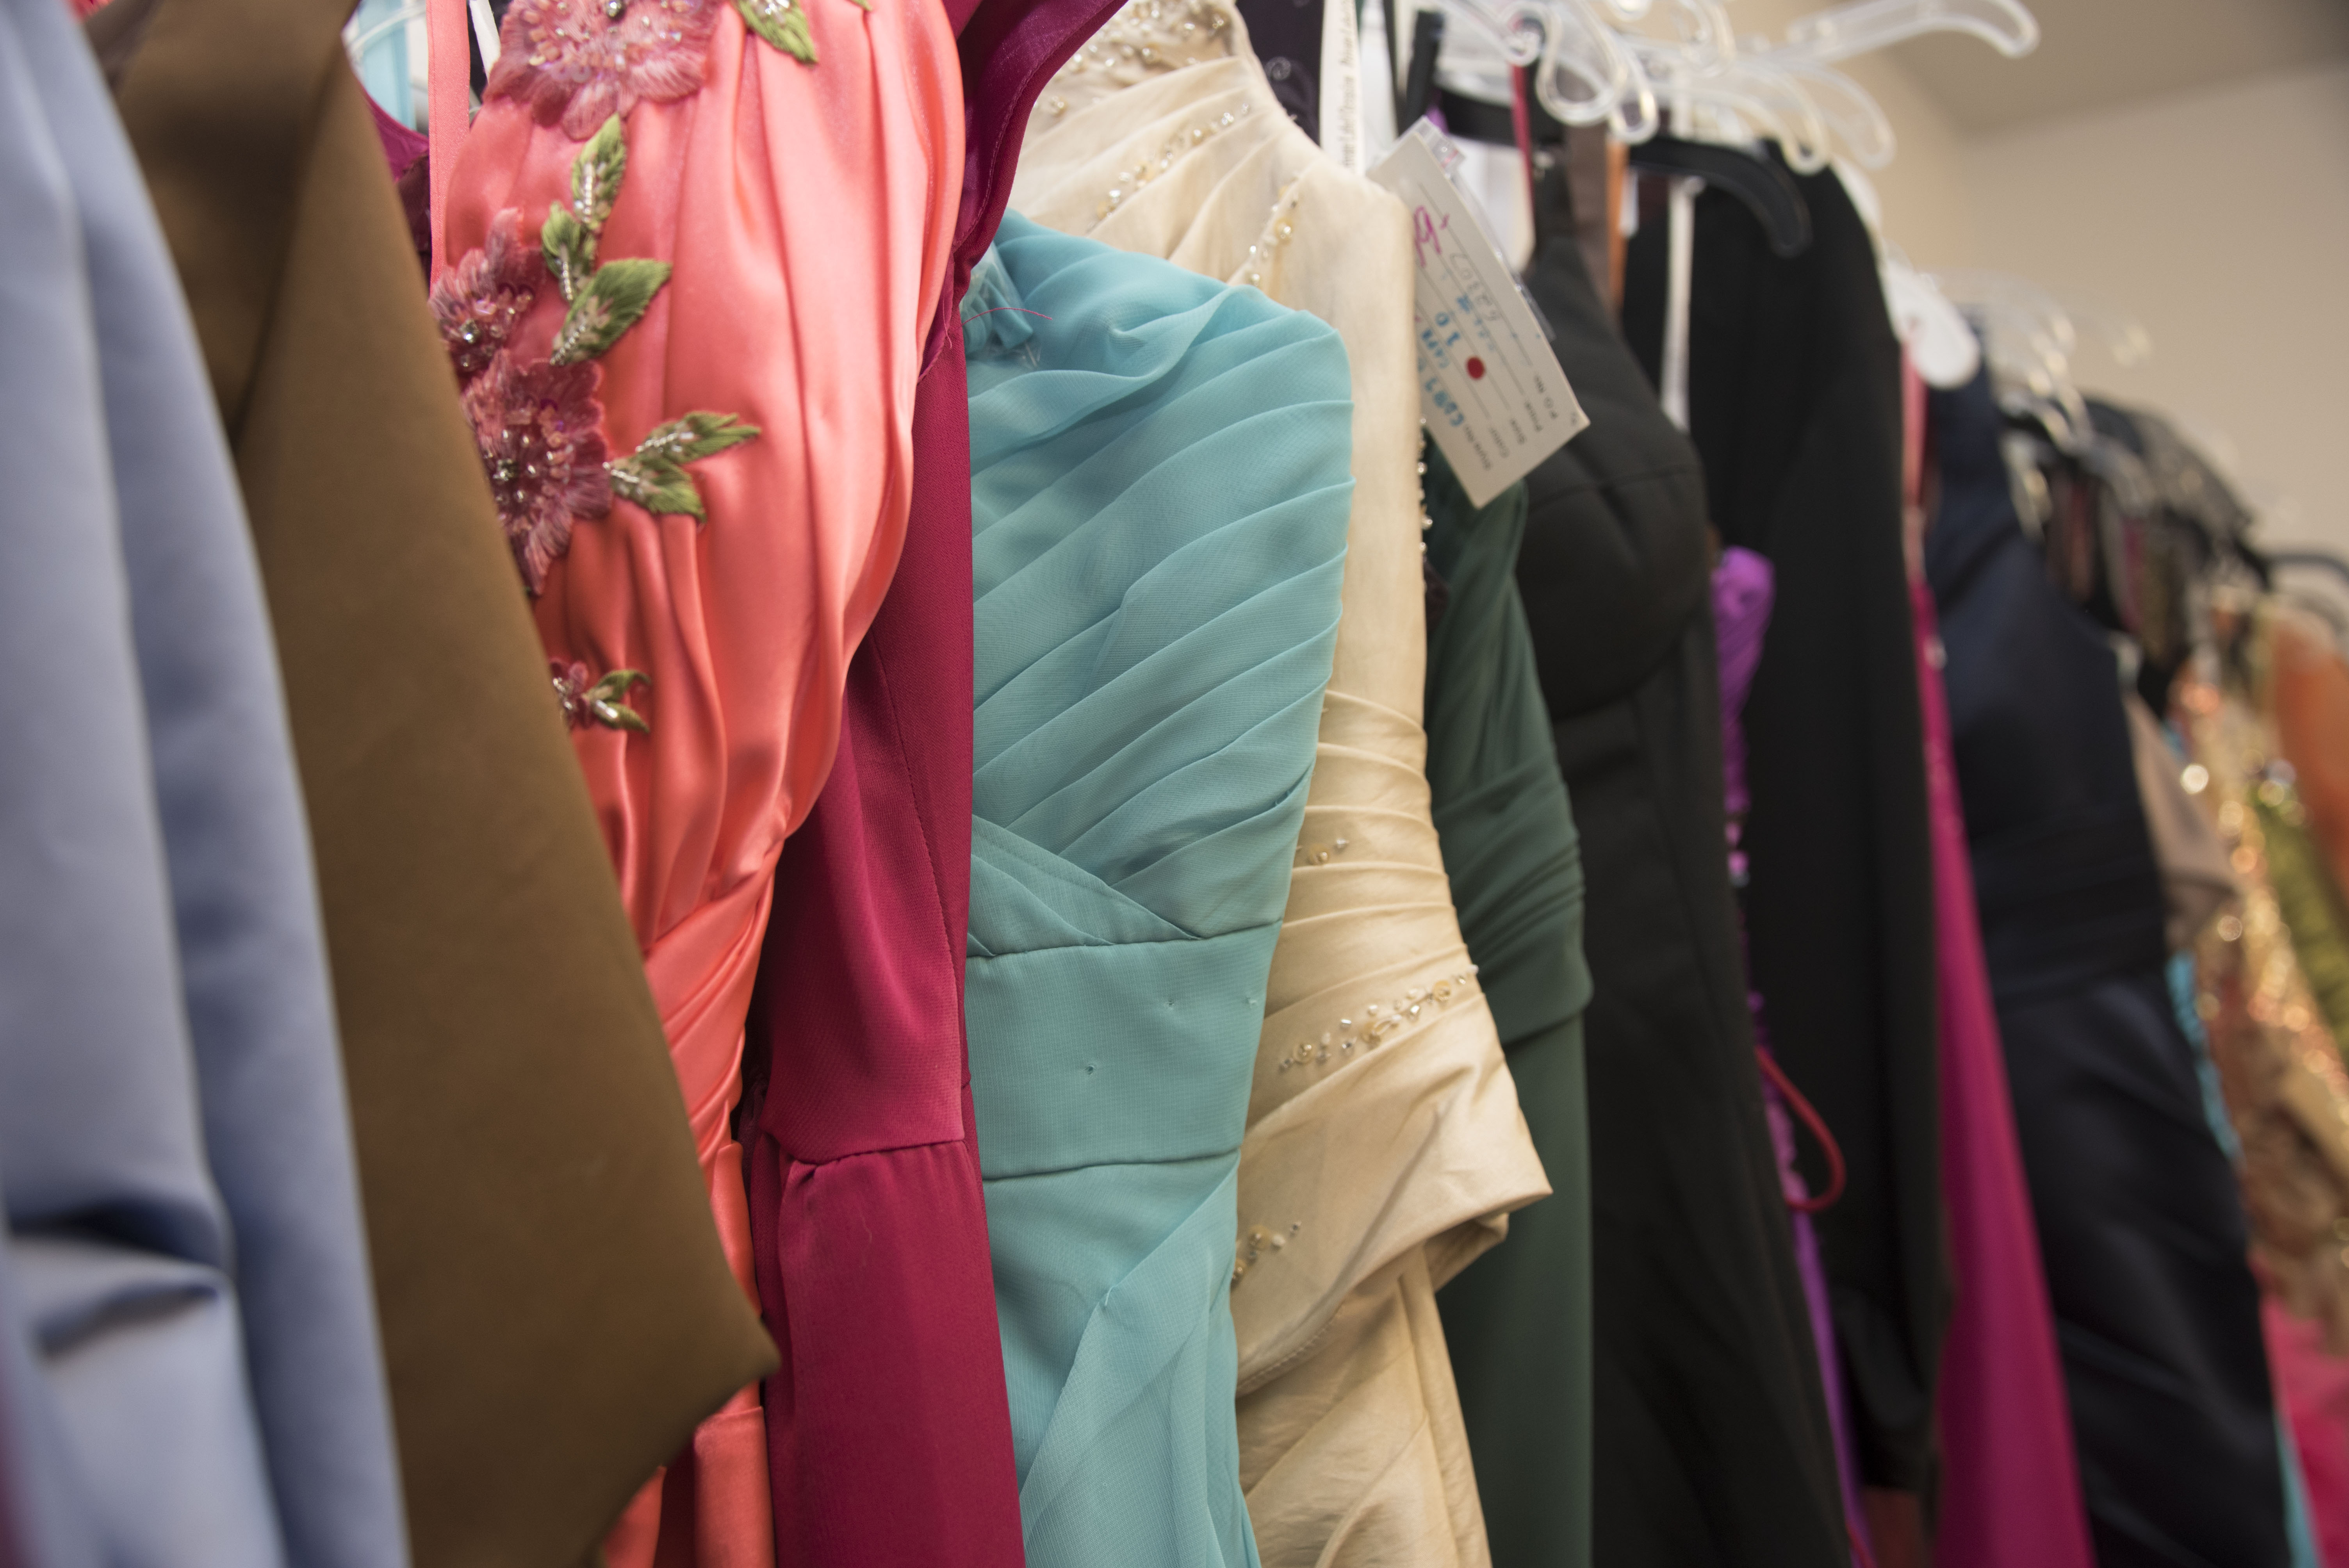 Cinderella S Closet Offers Formal Dresses For Loan